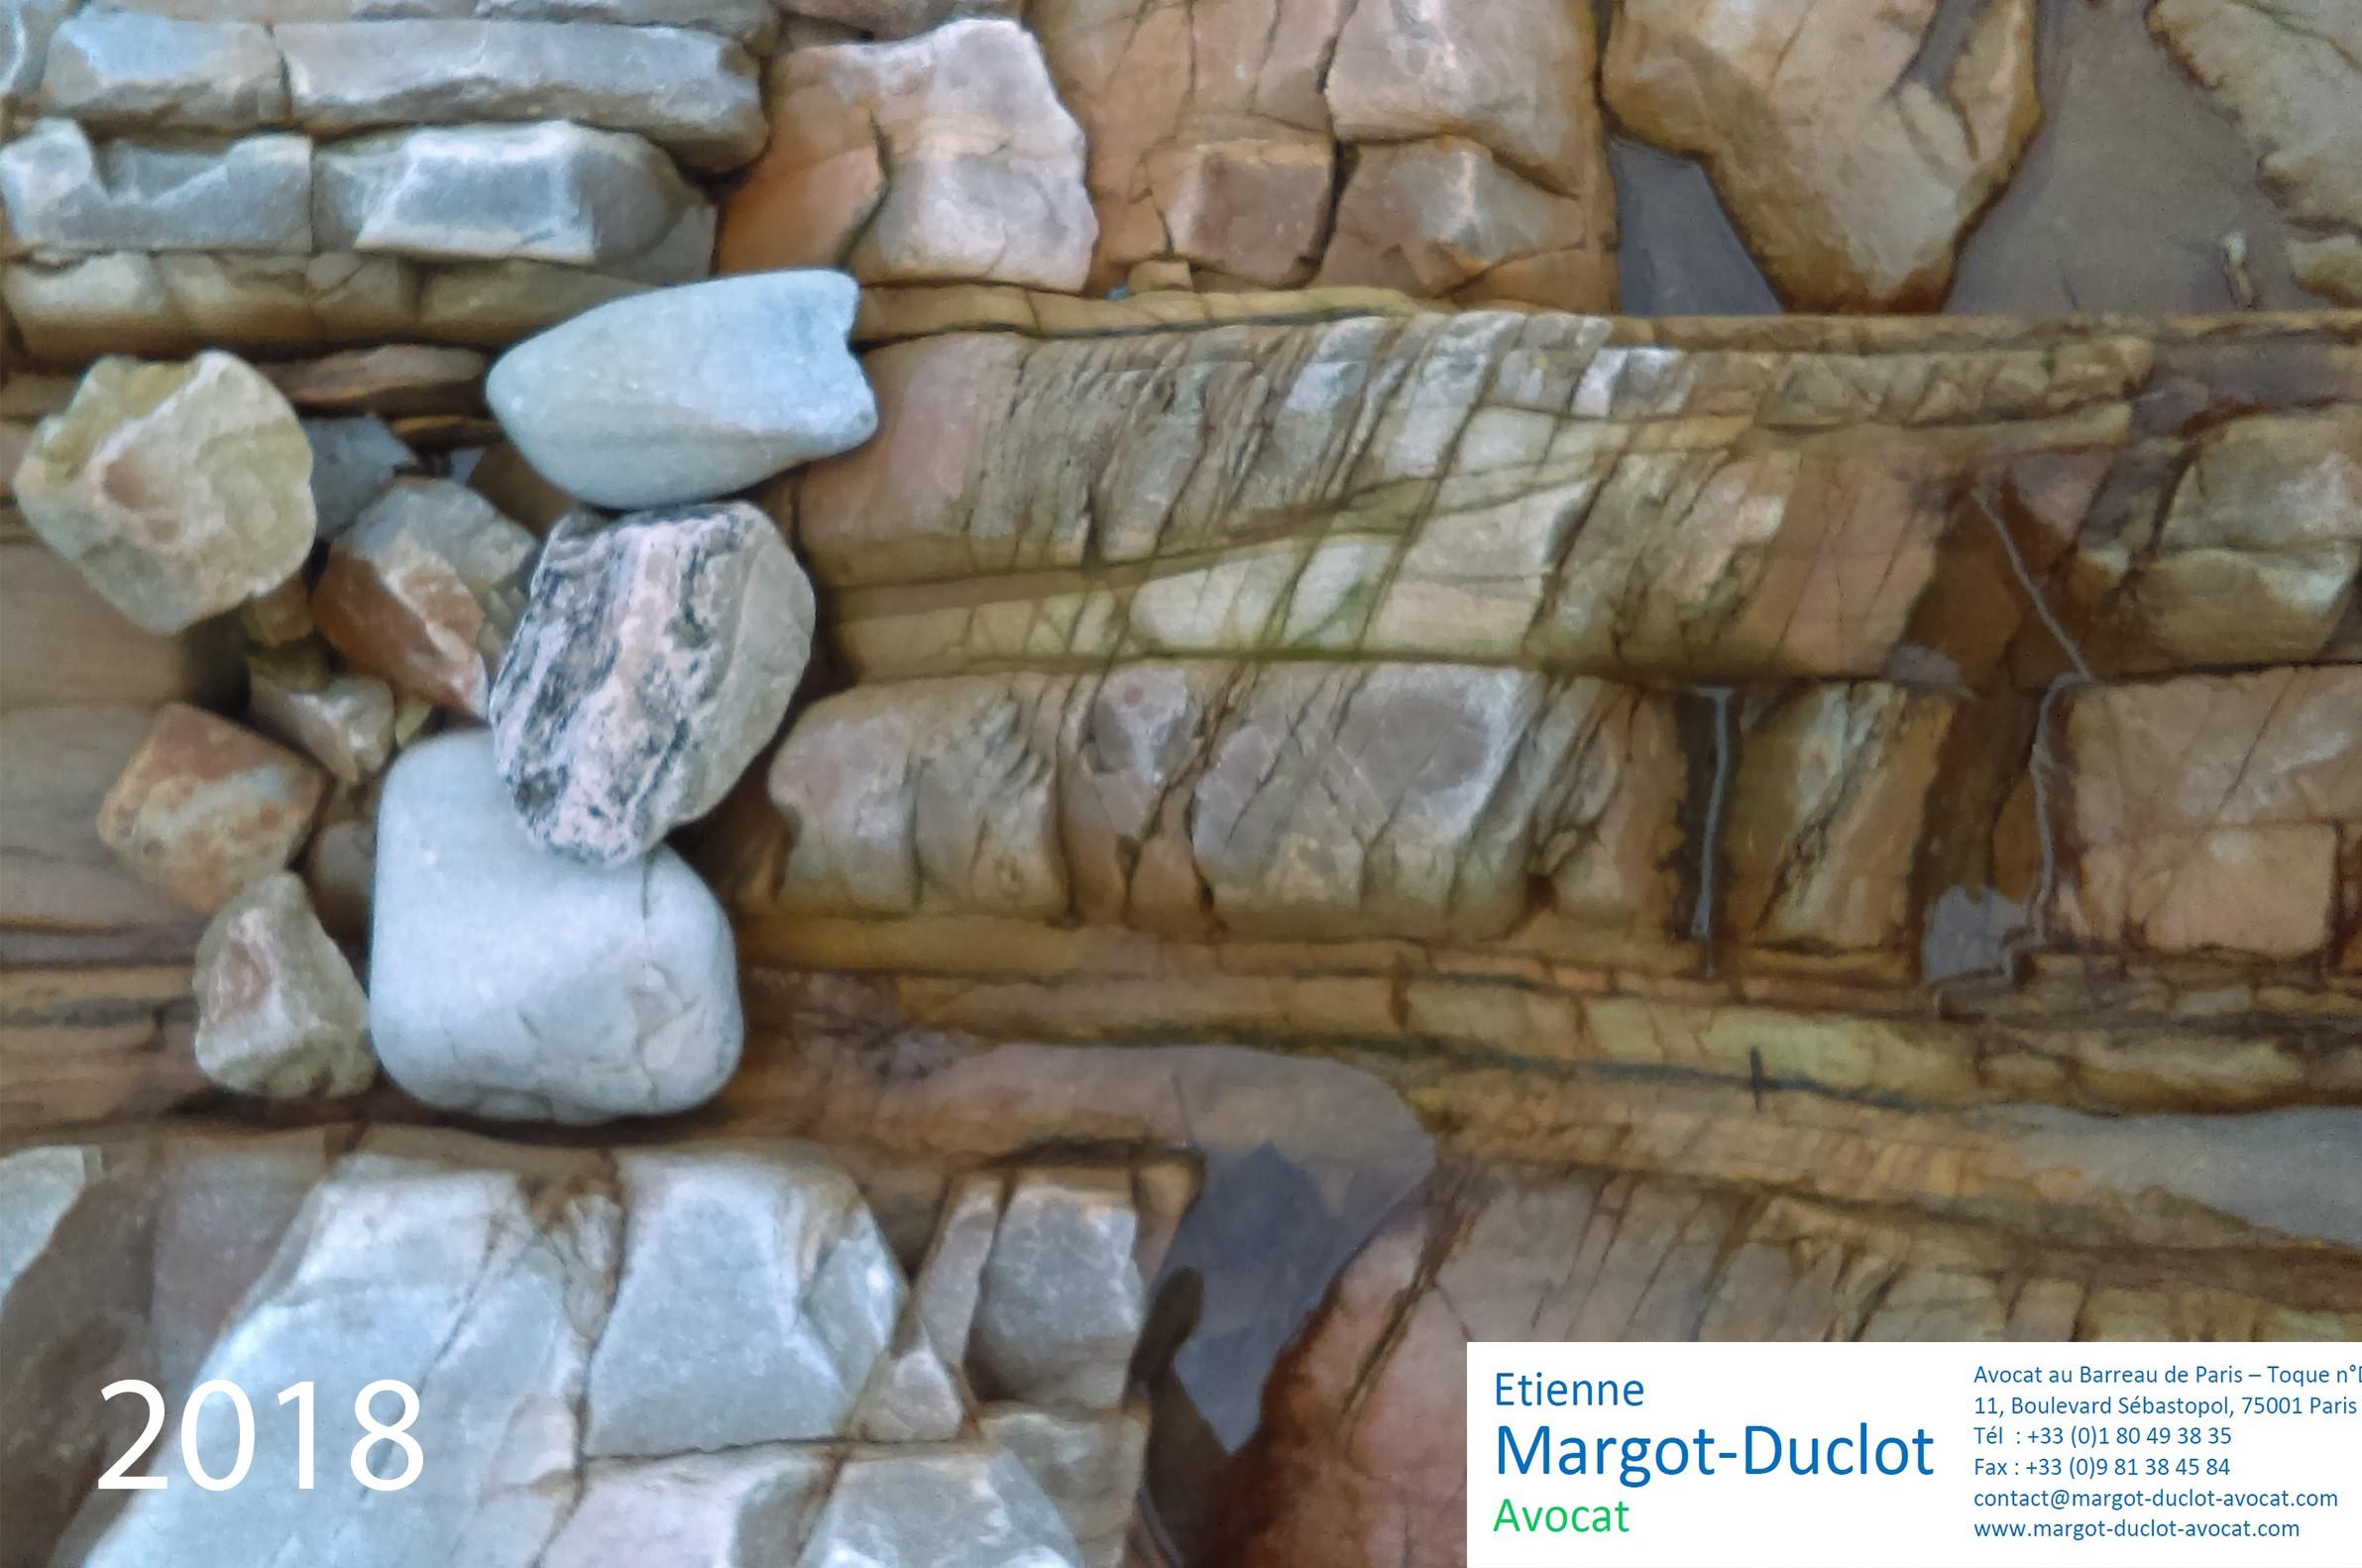 Voeux 2018 Margot-Duclot Avocat